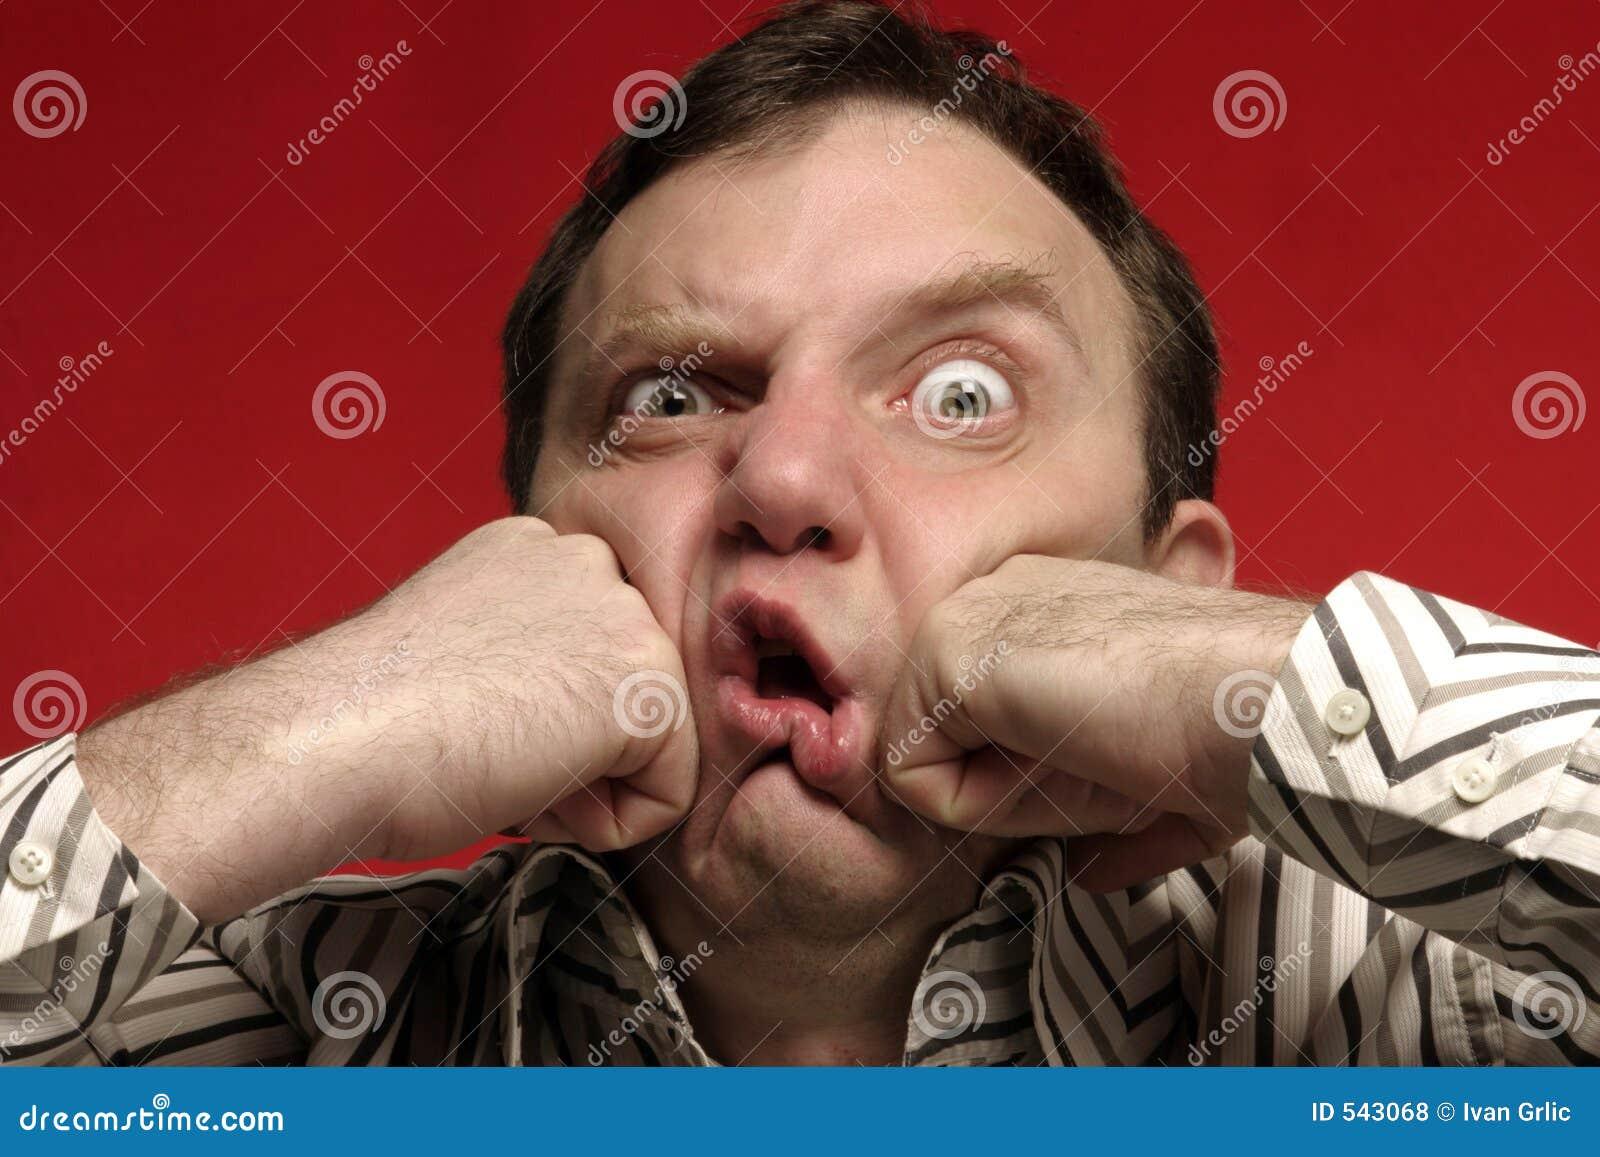 Download 吹动 库存照片. 图片 包括有 保护, ivan, 严格, 纵向, 鬼脸, 查找, 防御, 冲程, 手指, 鼻子 - 543068